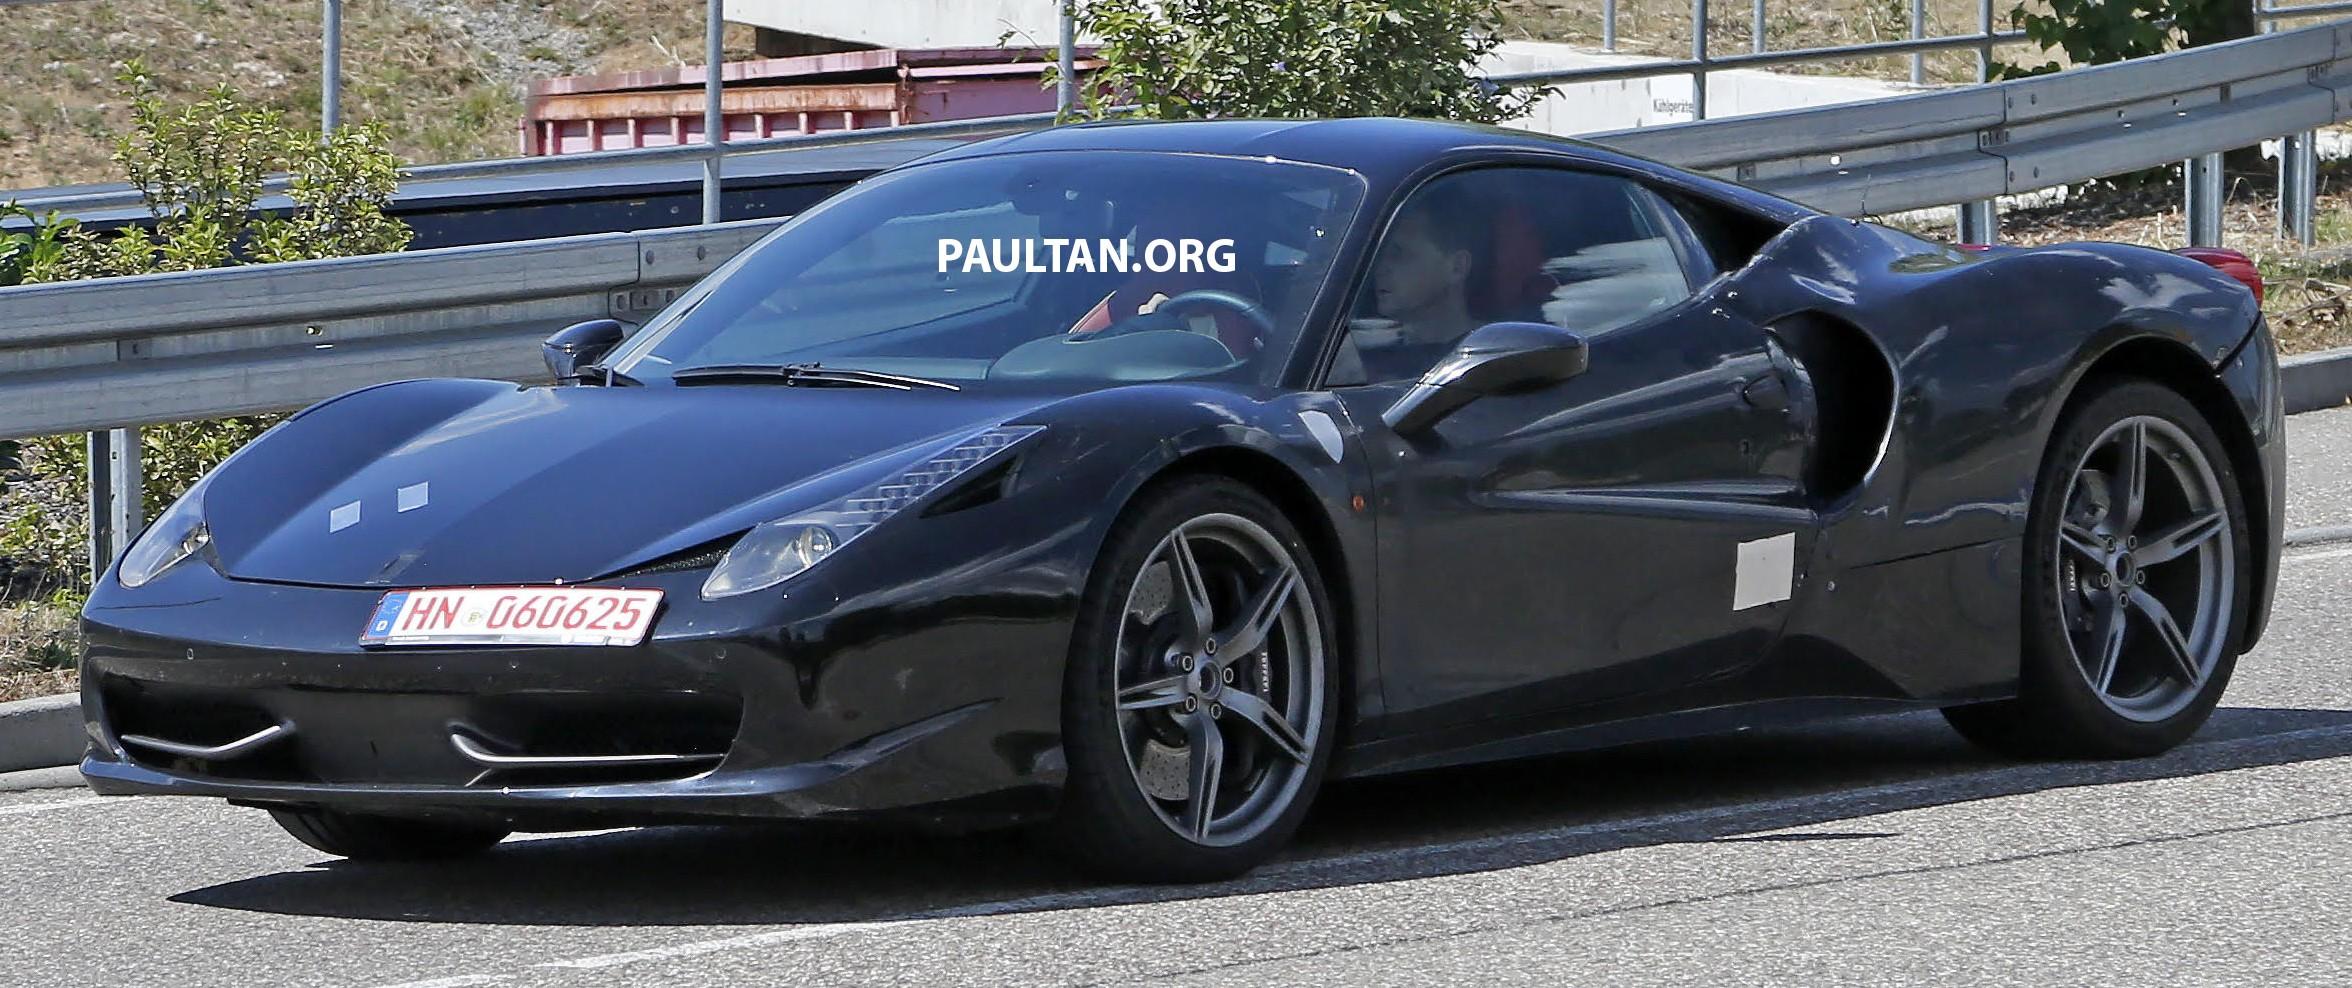 Ferrari Dino 2019 >> SPIED: 2019 Ferrari Dino captured for the first time!